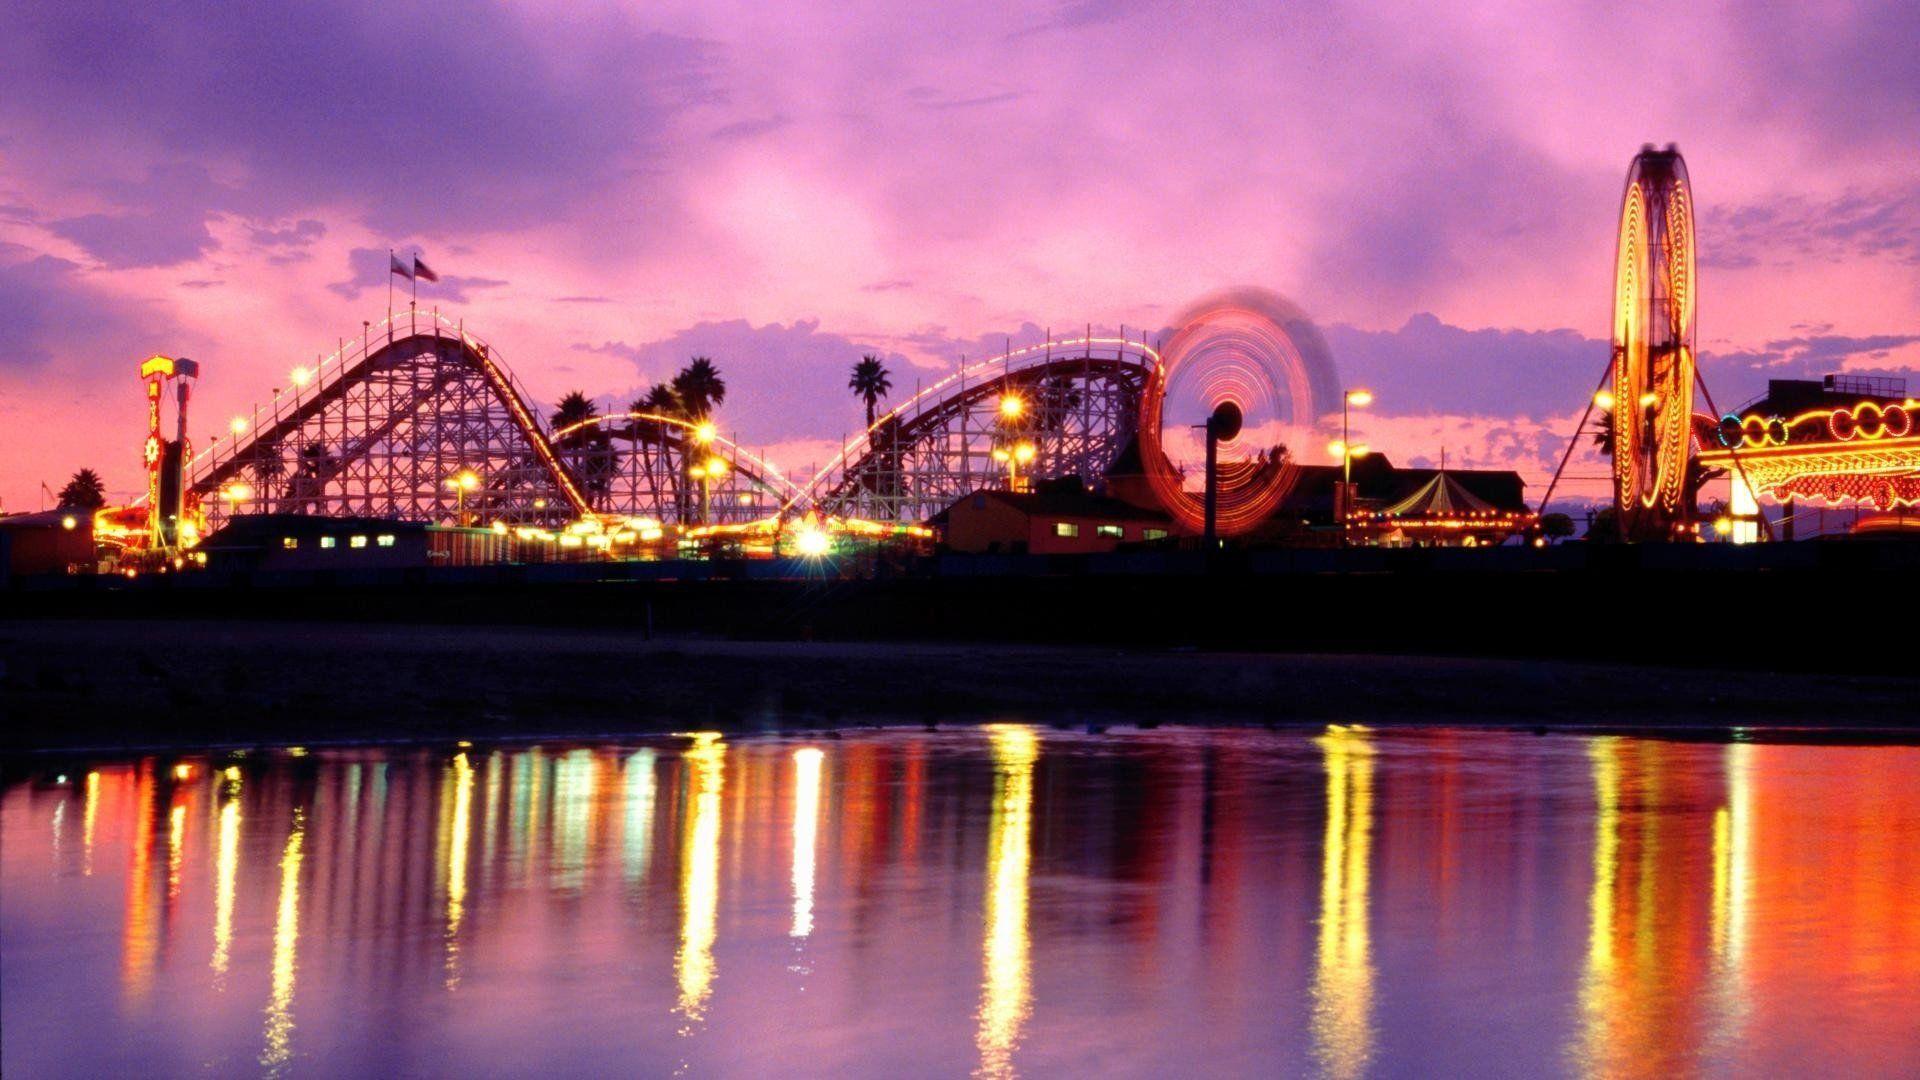 Theme Park Wallpapers   Top Theme Park Backgrounds 1920x1080